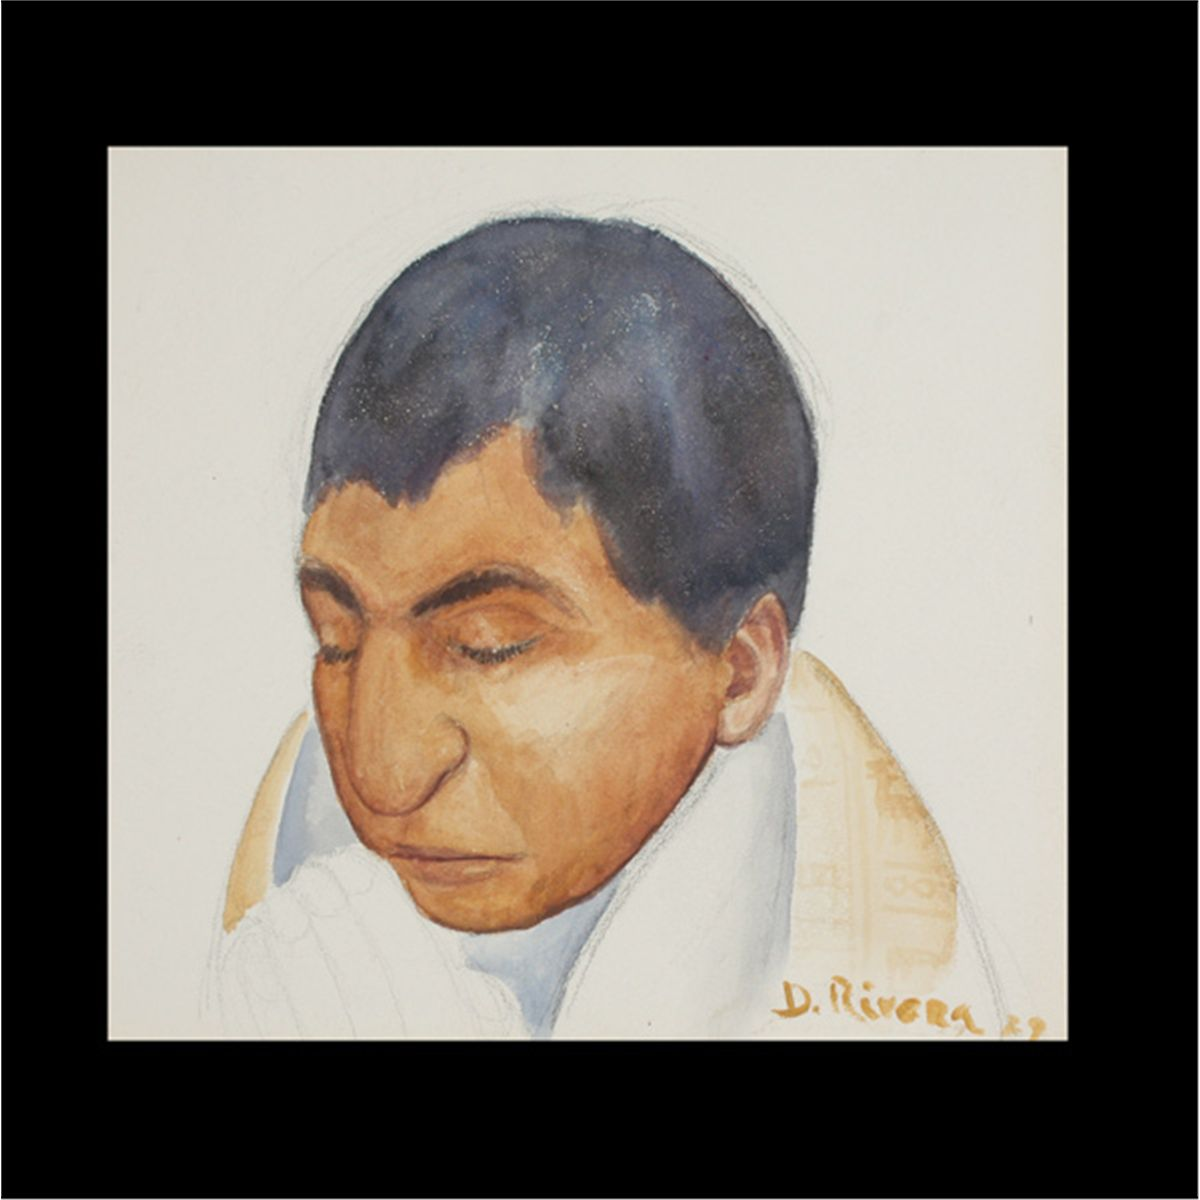 1200x1200 Diego Rivera, Portrait Study, Watercolor